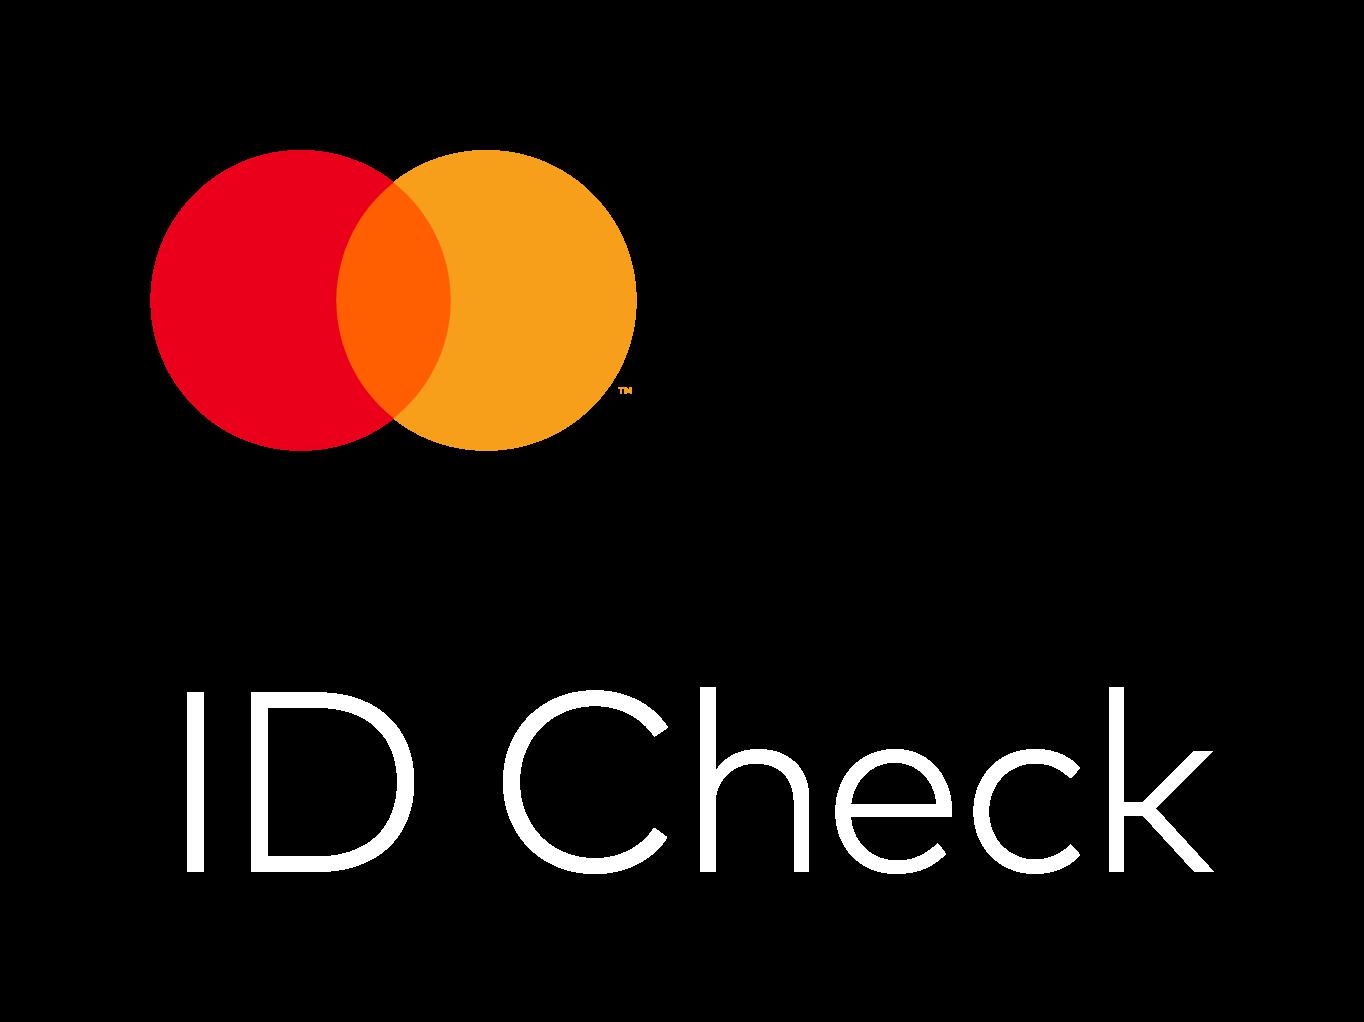 ID Check